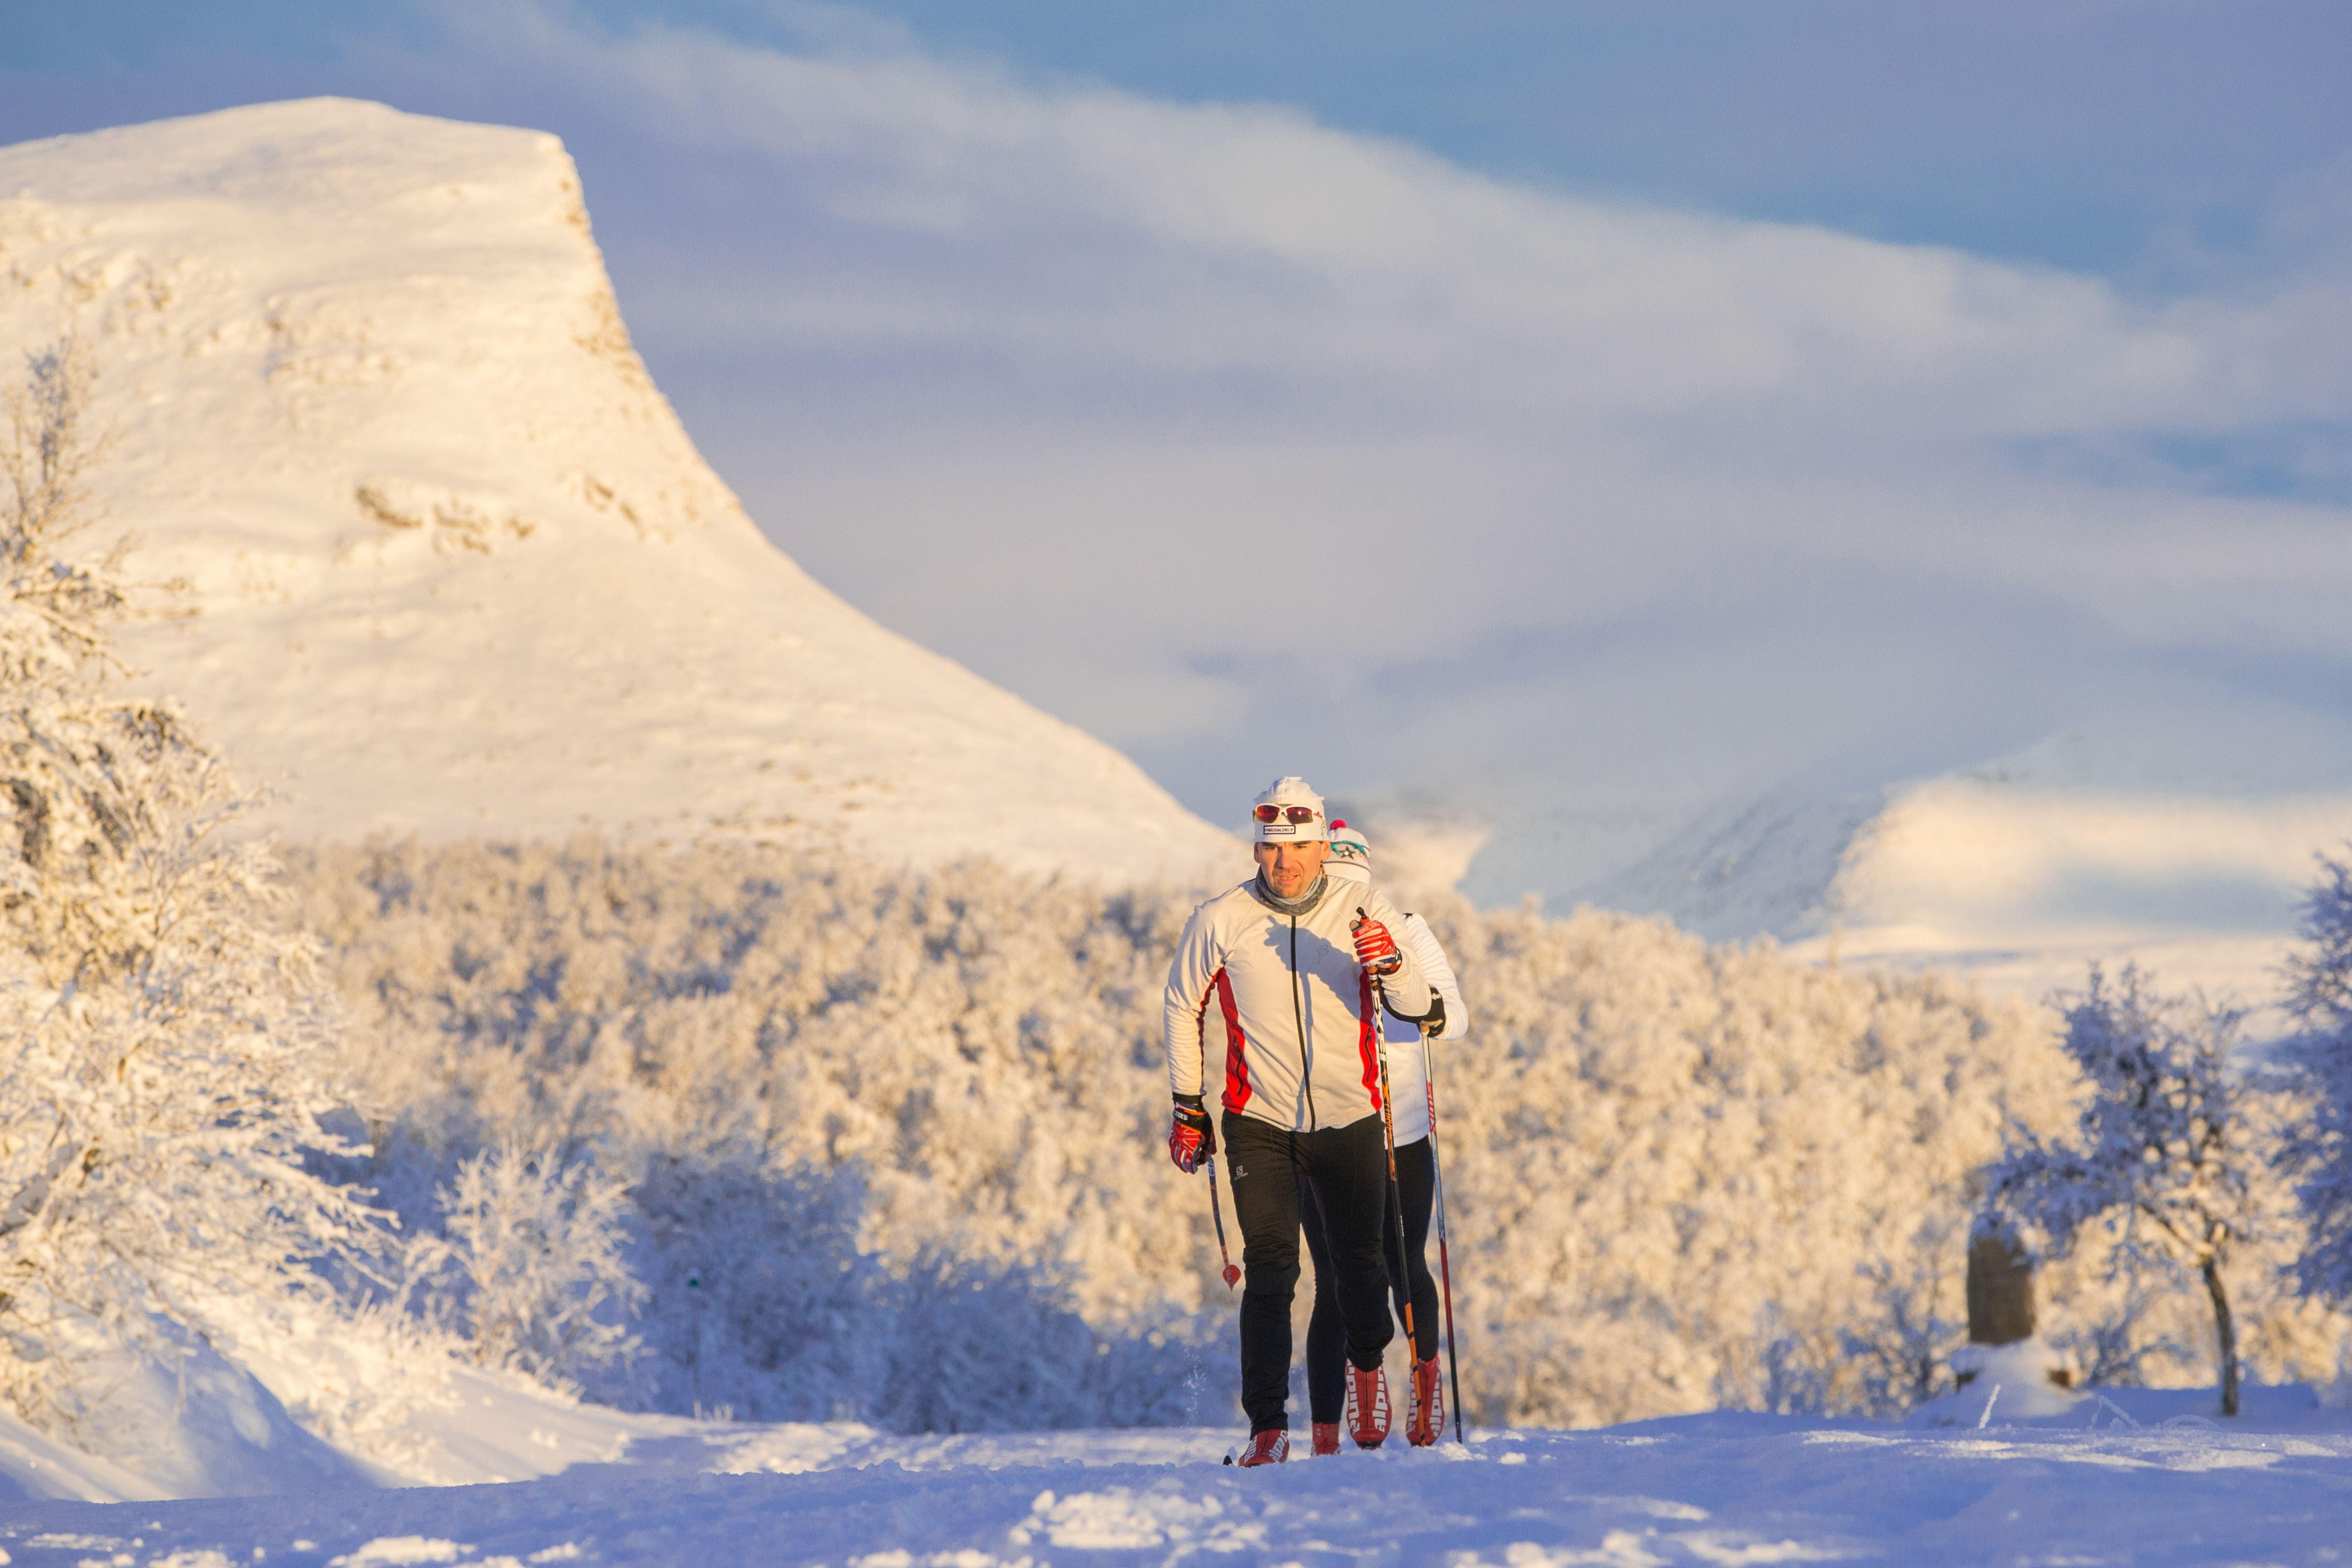 Mikaelas Ski School Bruksvallarna